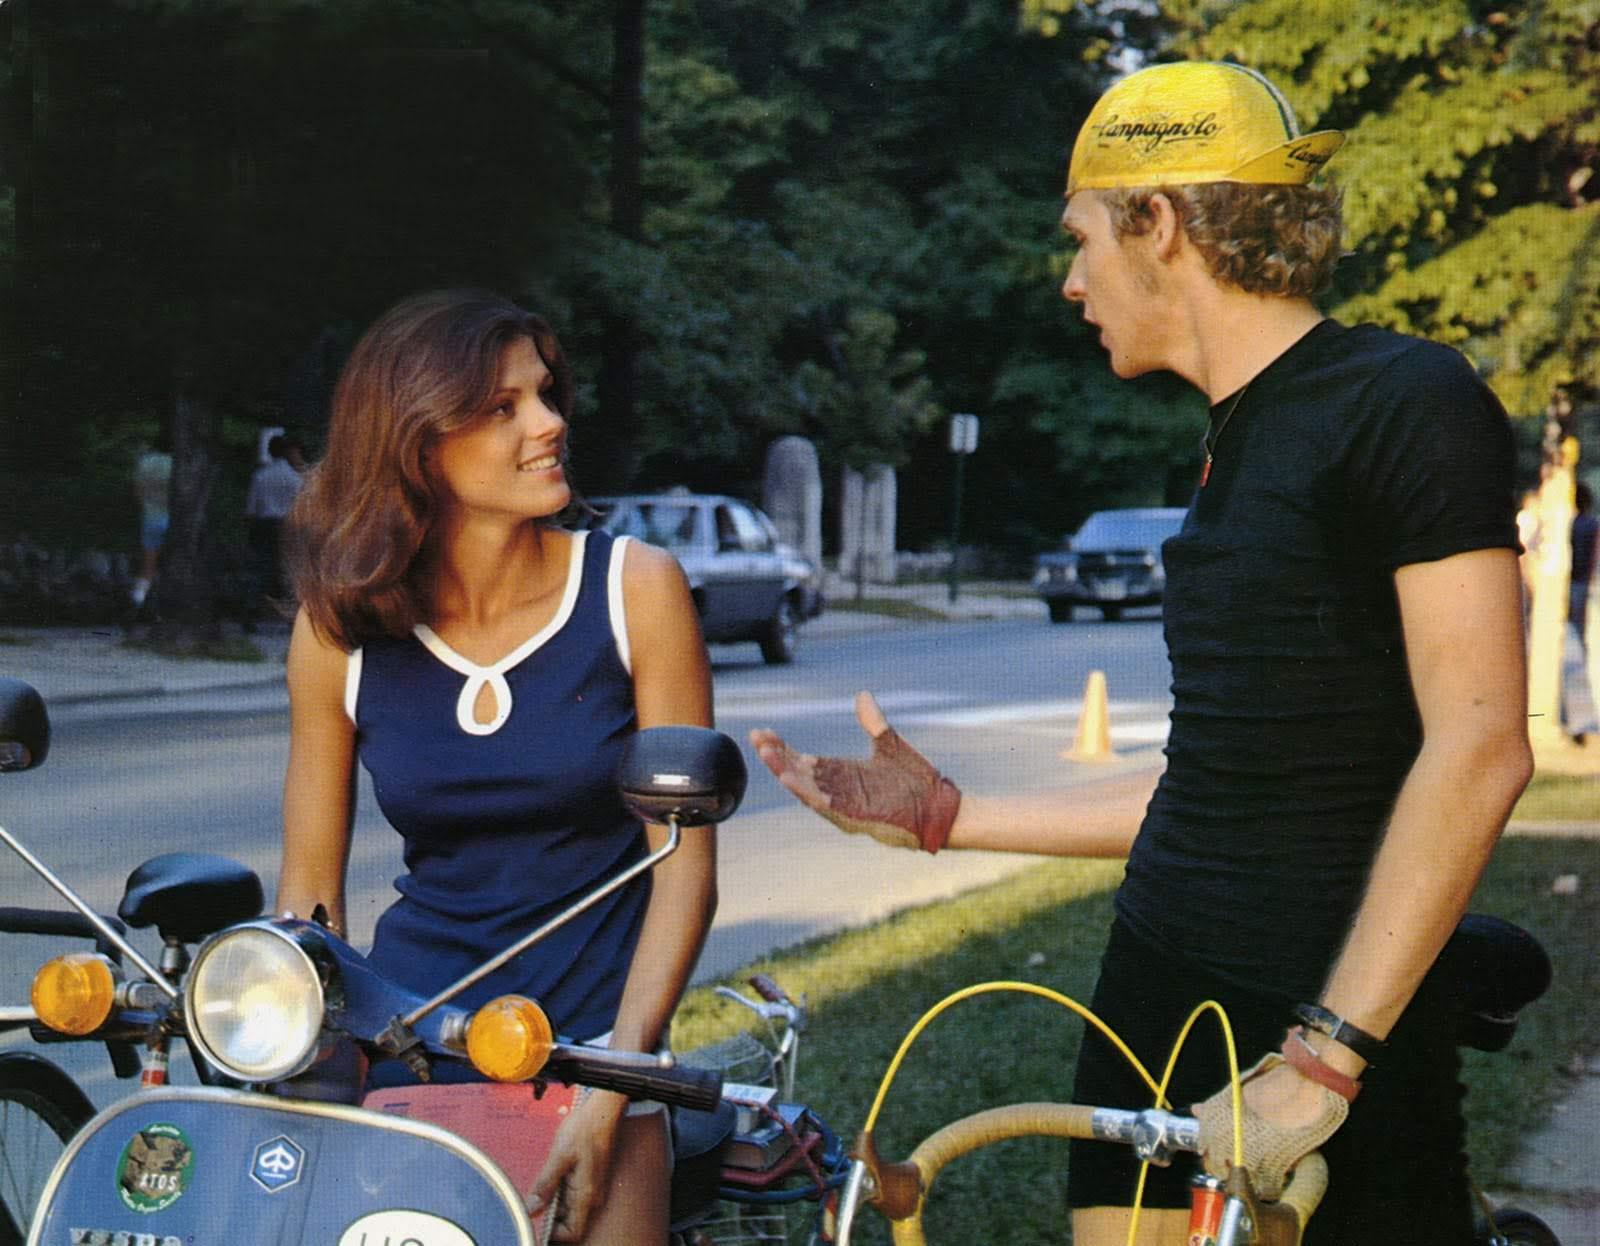 Movie Shopper's Guide - Breaking Away : デニス・クリストファーが自転車好きの青年を演じ、オスカー計5部門ノミネートの青春映画の名作「ヤング・ゼネレーション」の Blu-ray が、新年2019年2月8日に発売 ! !